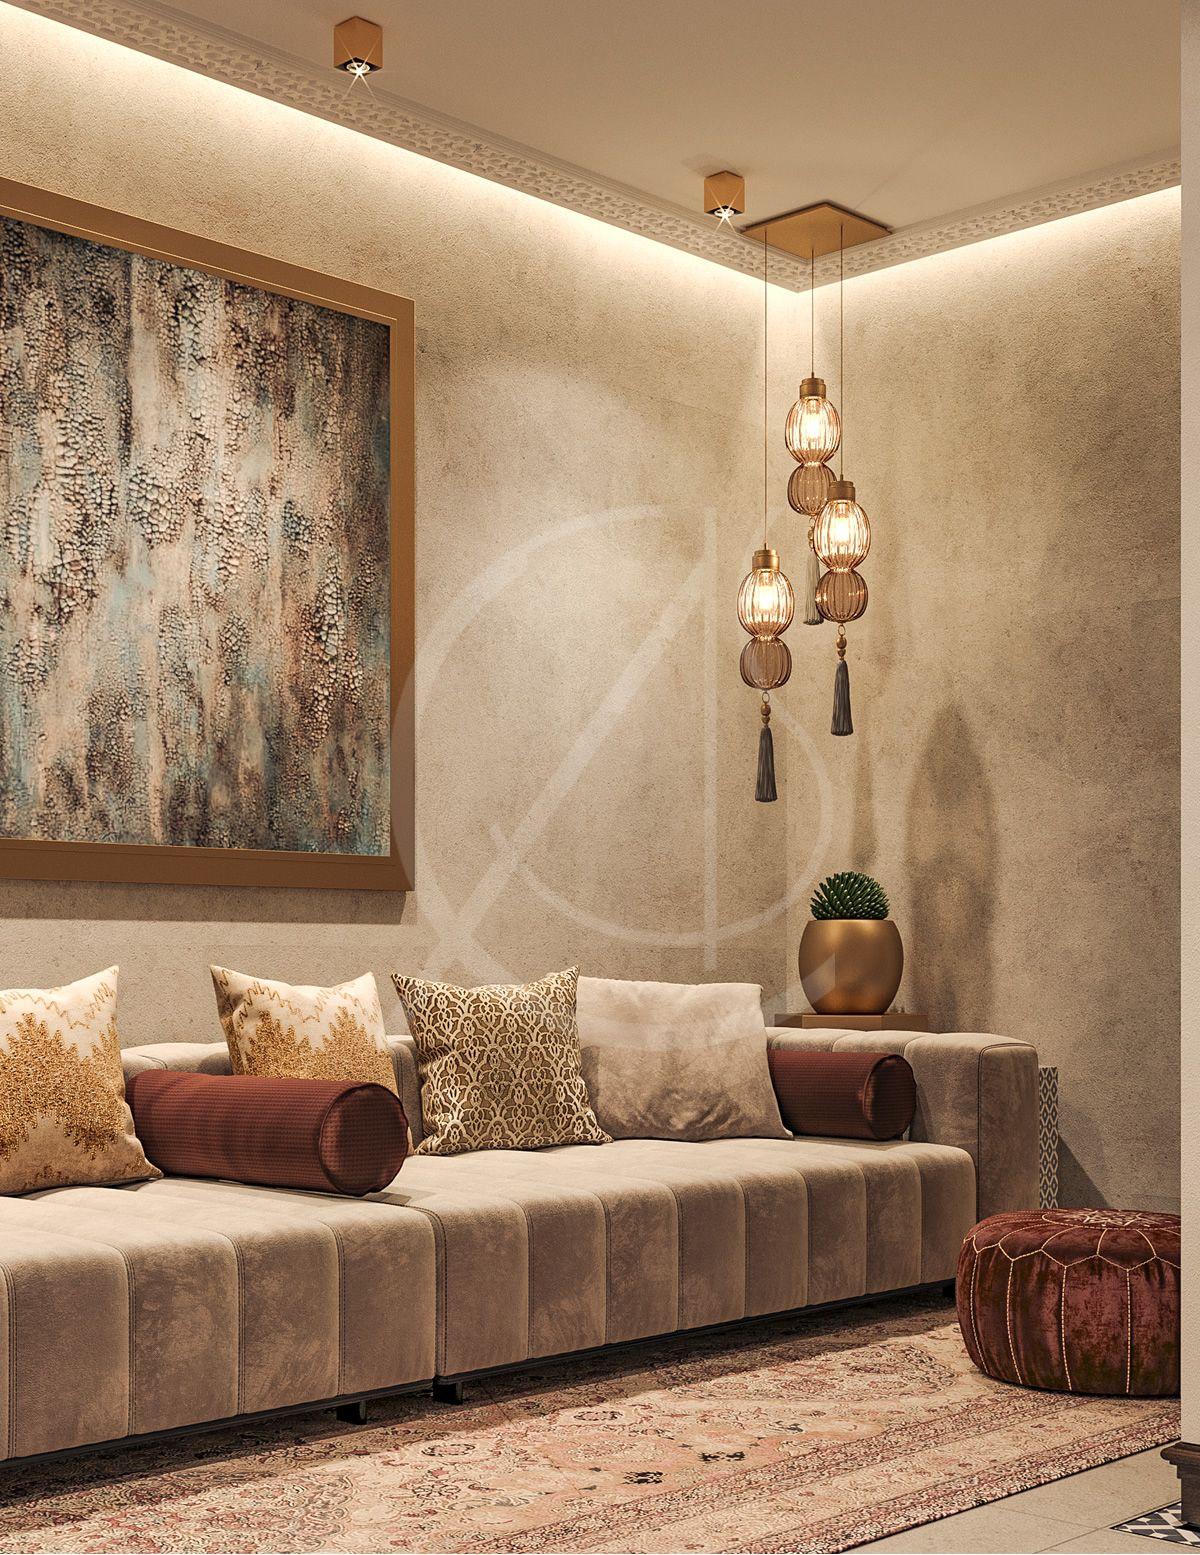 Aswar Hotel - Modern Moroccan Hotel Design  Khobar, KSA - CAS